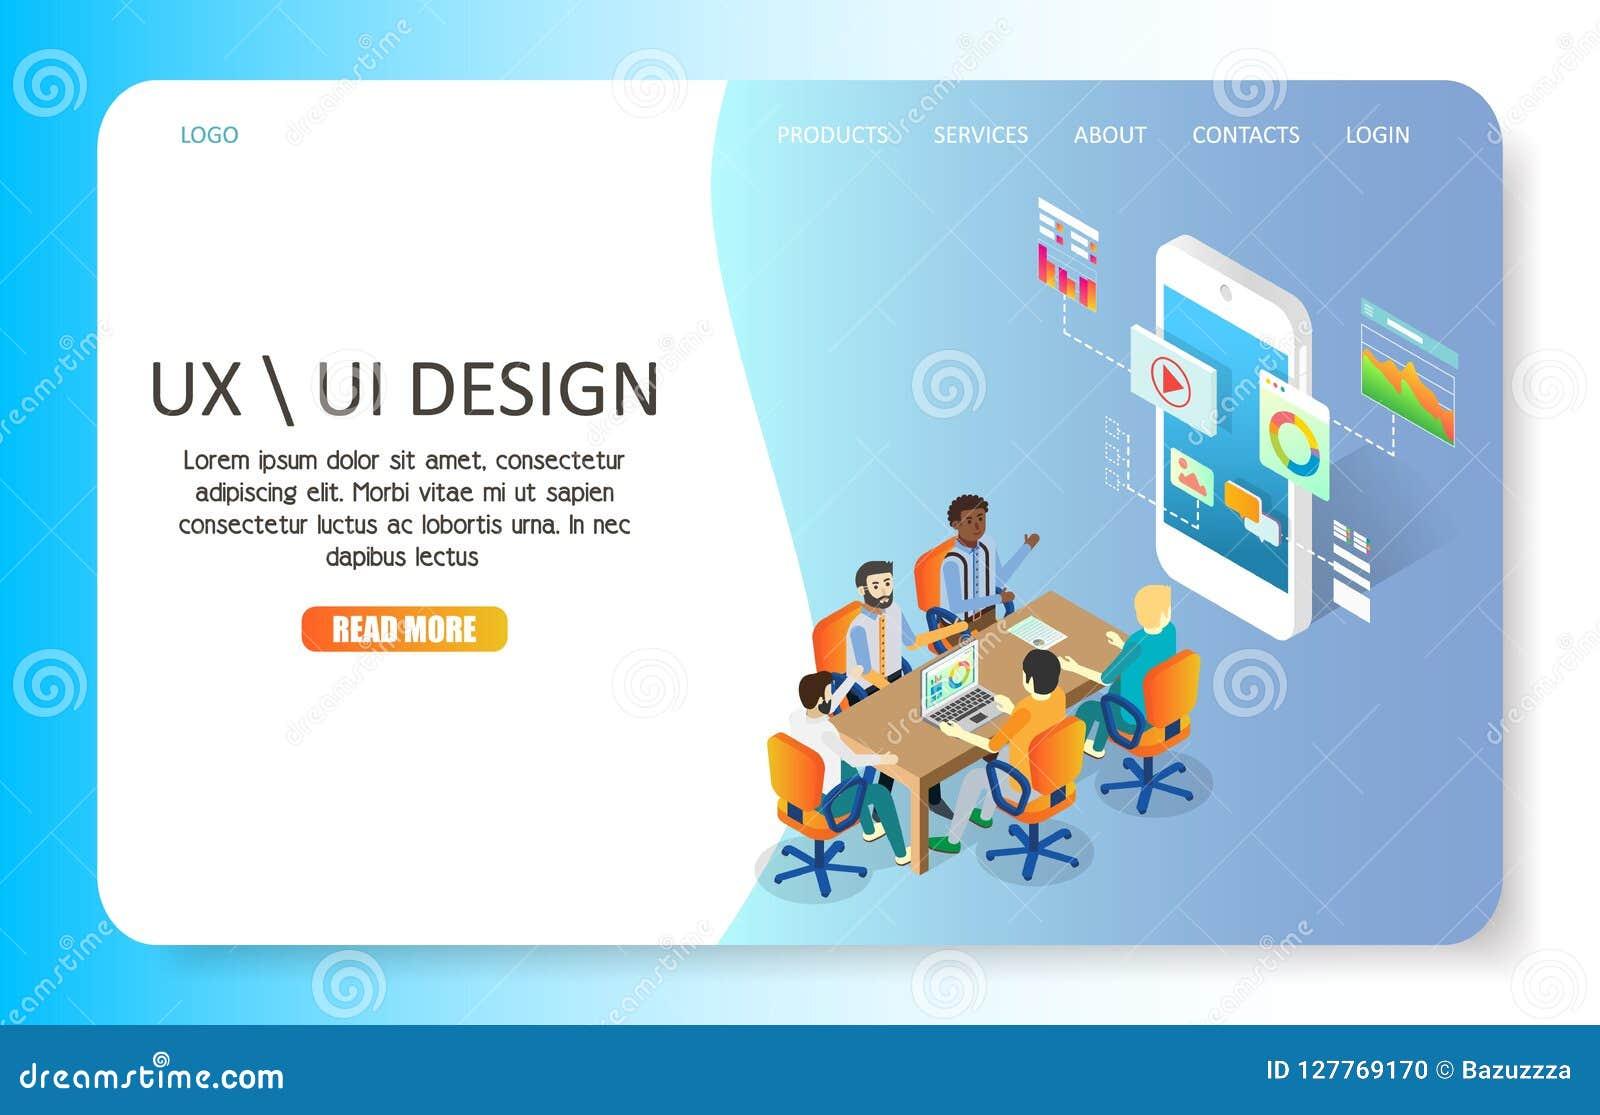 UX Or UI Design Landing Page Website Vector Template Stock Vector